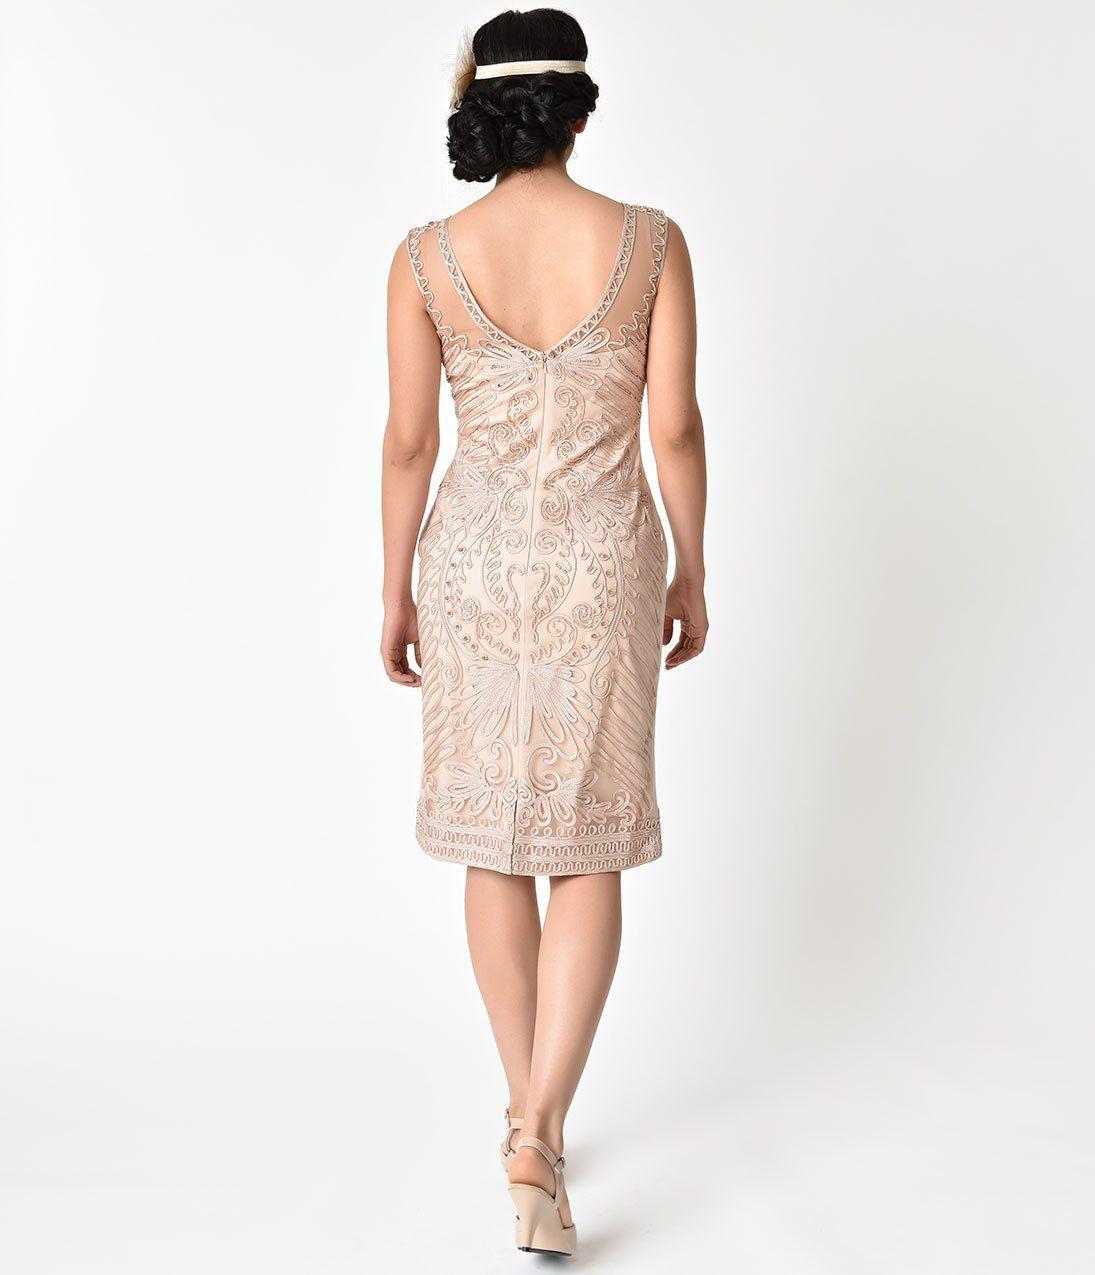 b8b2340d19b Plus Size Champagne Embroidered   Beaded V-Neck Mesh Cocktail Dress –  Unique Vintage